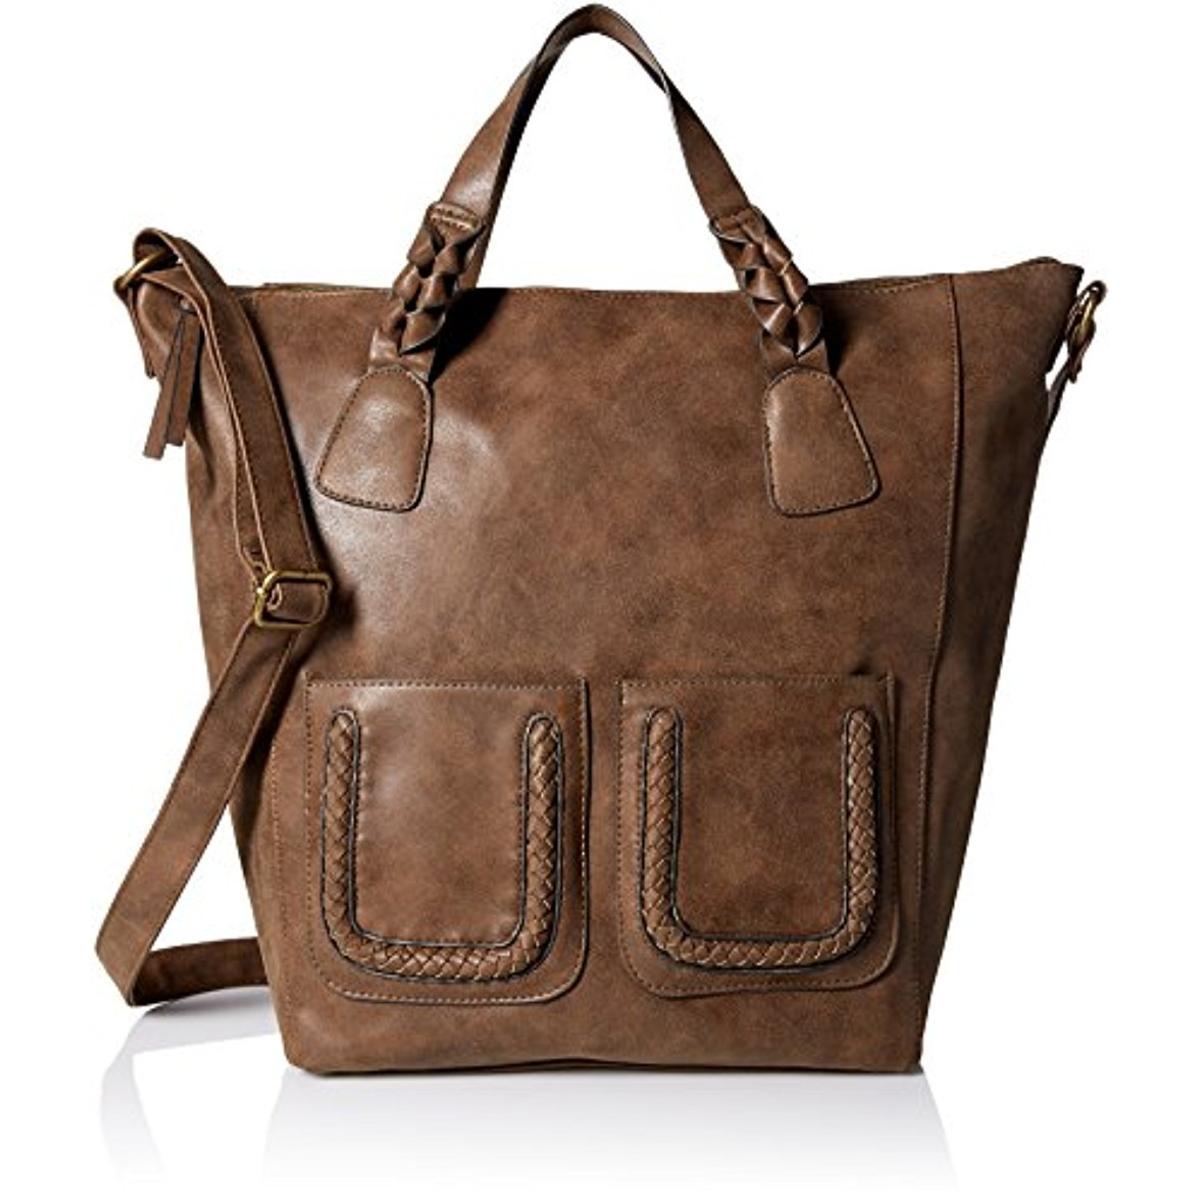 T Shirt Jeans 1366 Womens Brown Tote Handbag Purse Extra